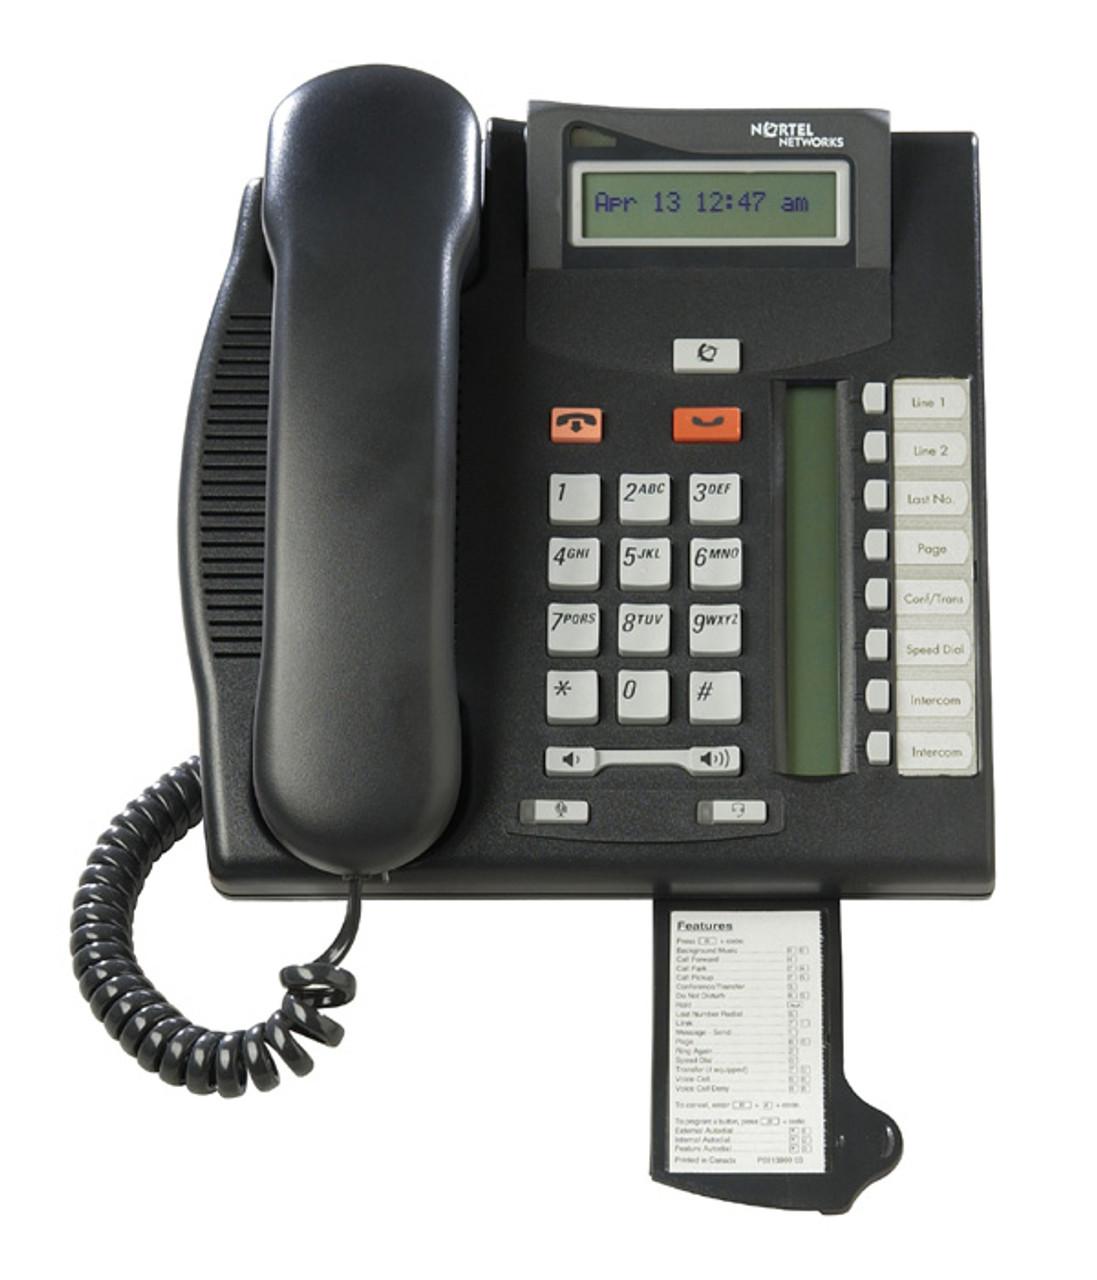 small resolution of nortel norstar t7208 telephone